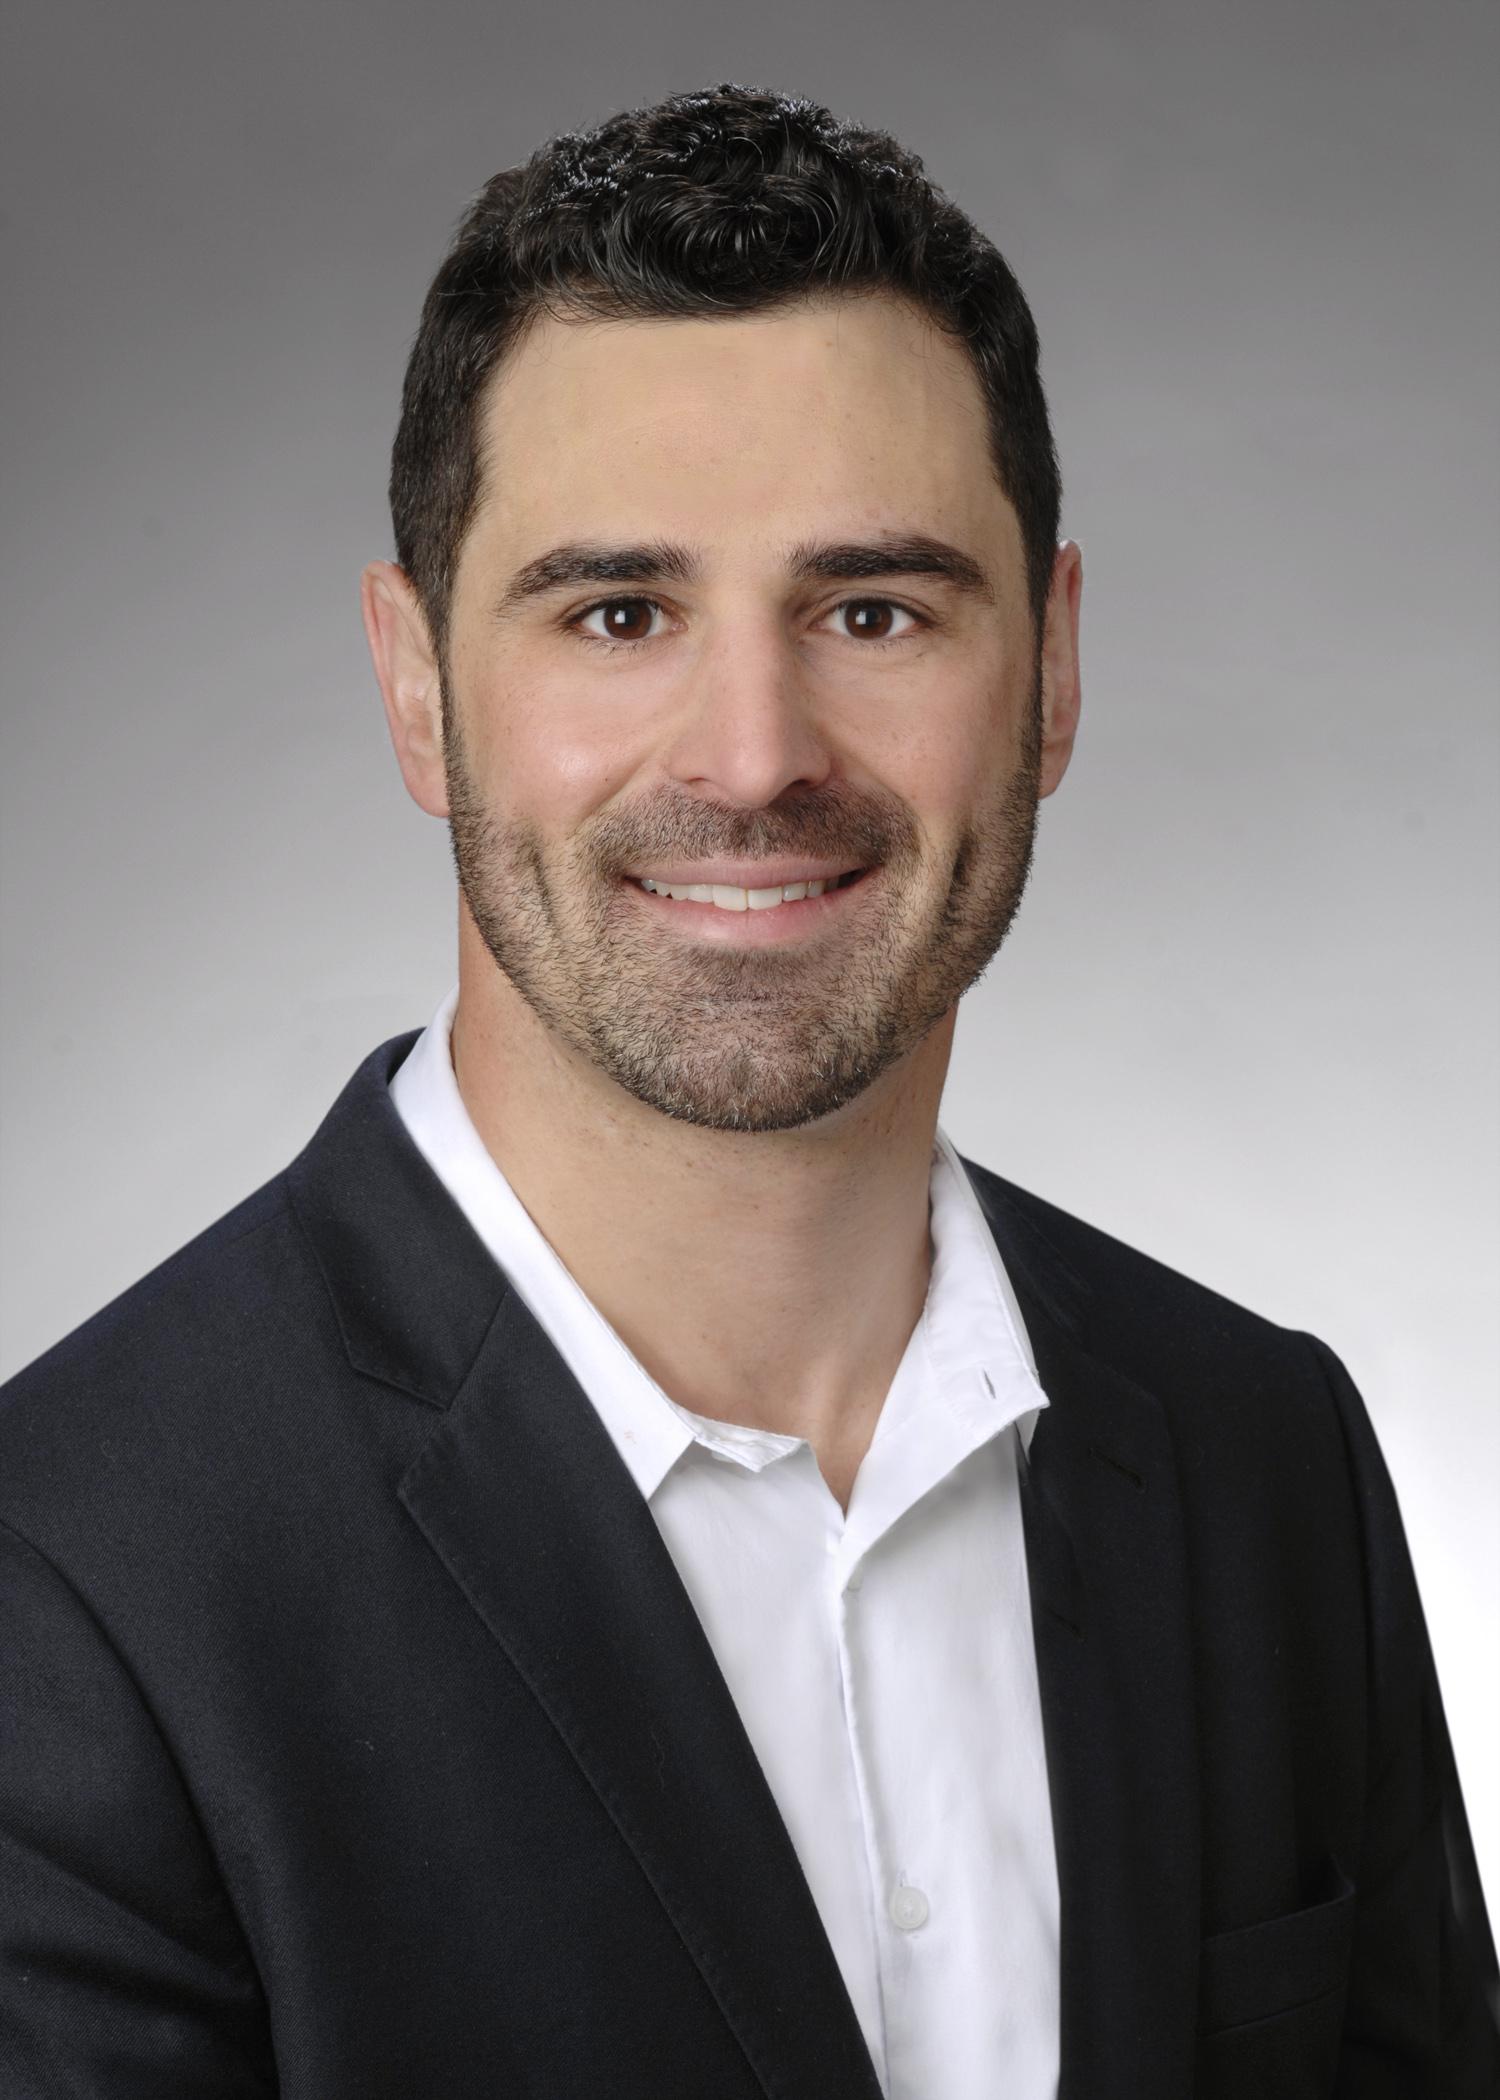 Graig Norden, President of Freewheel Marketing